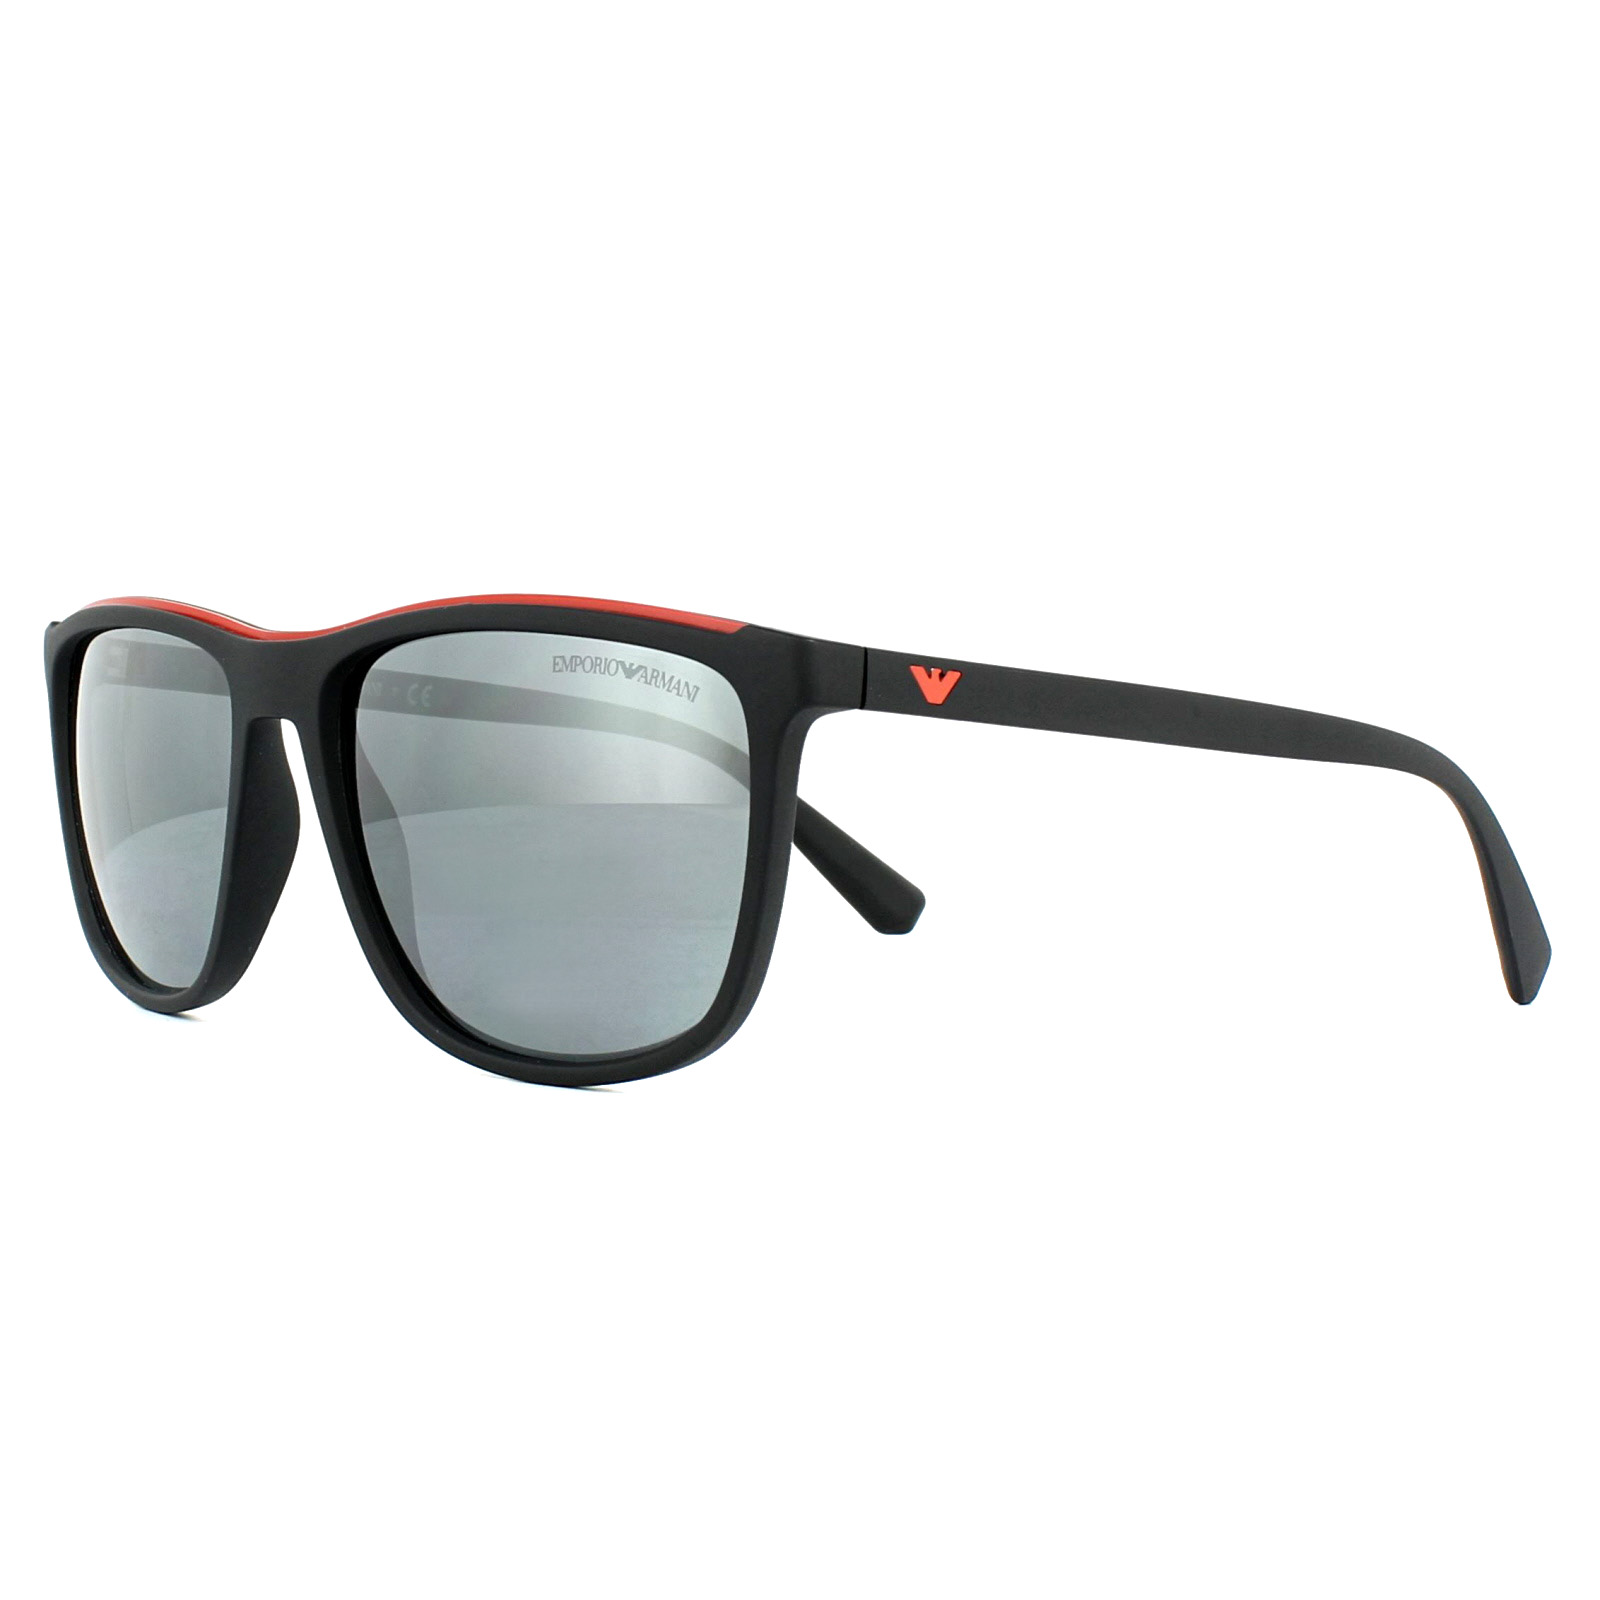 fbe72657d3f3 Sentinel Emporio Armani Sunglasses EA4109 50426G Matt Black Light Grey  Mirror Black